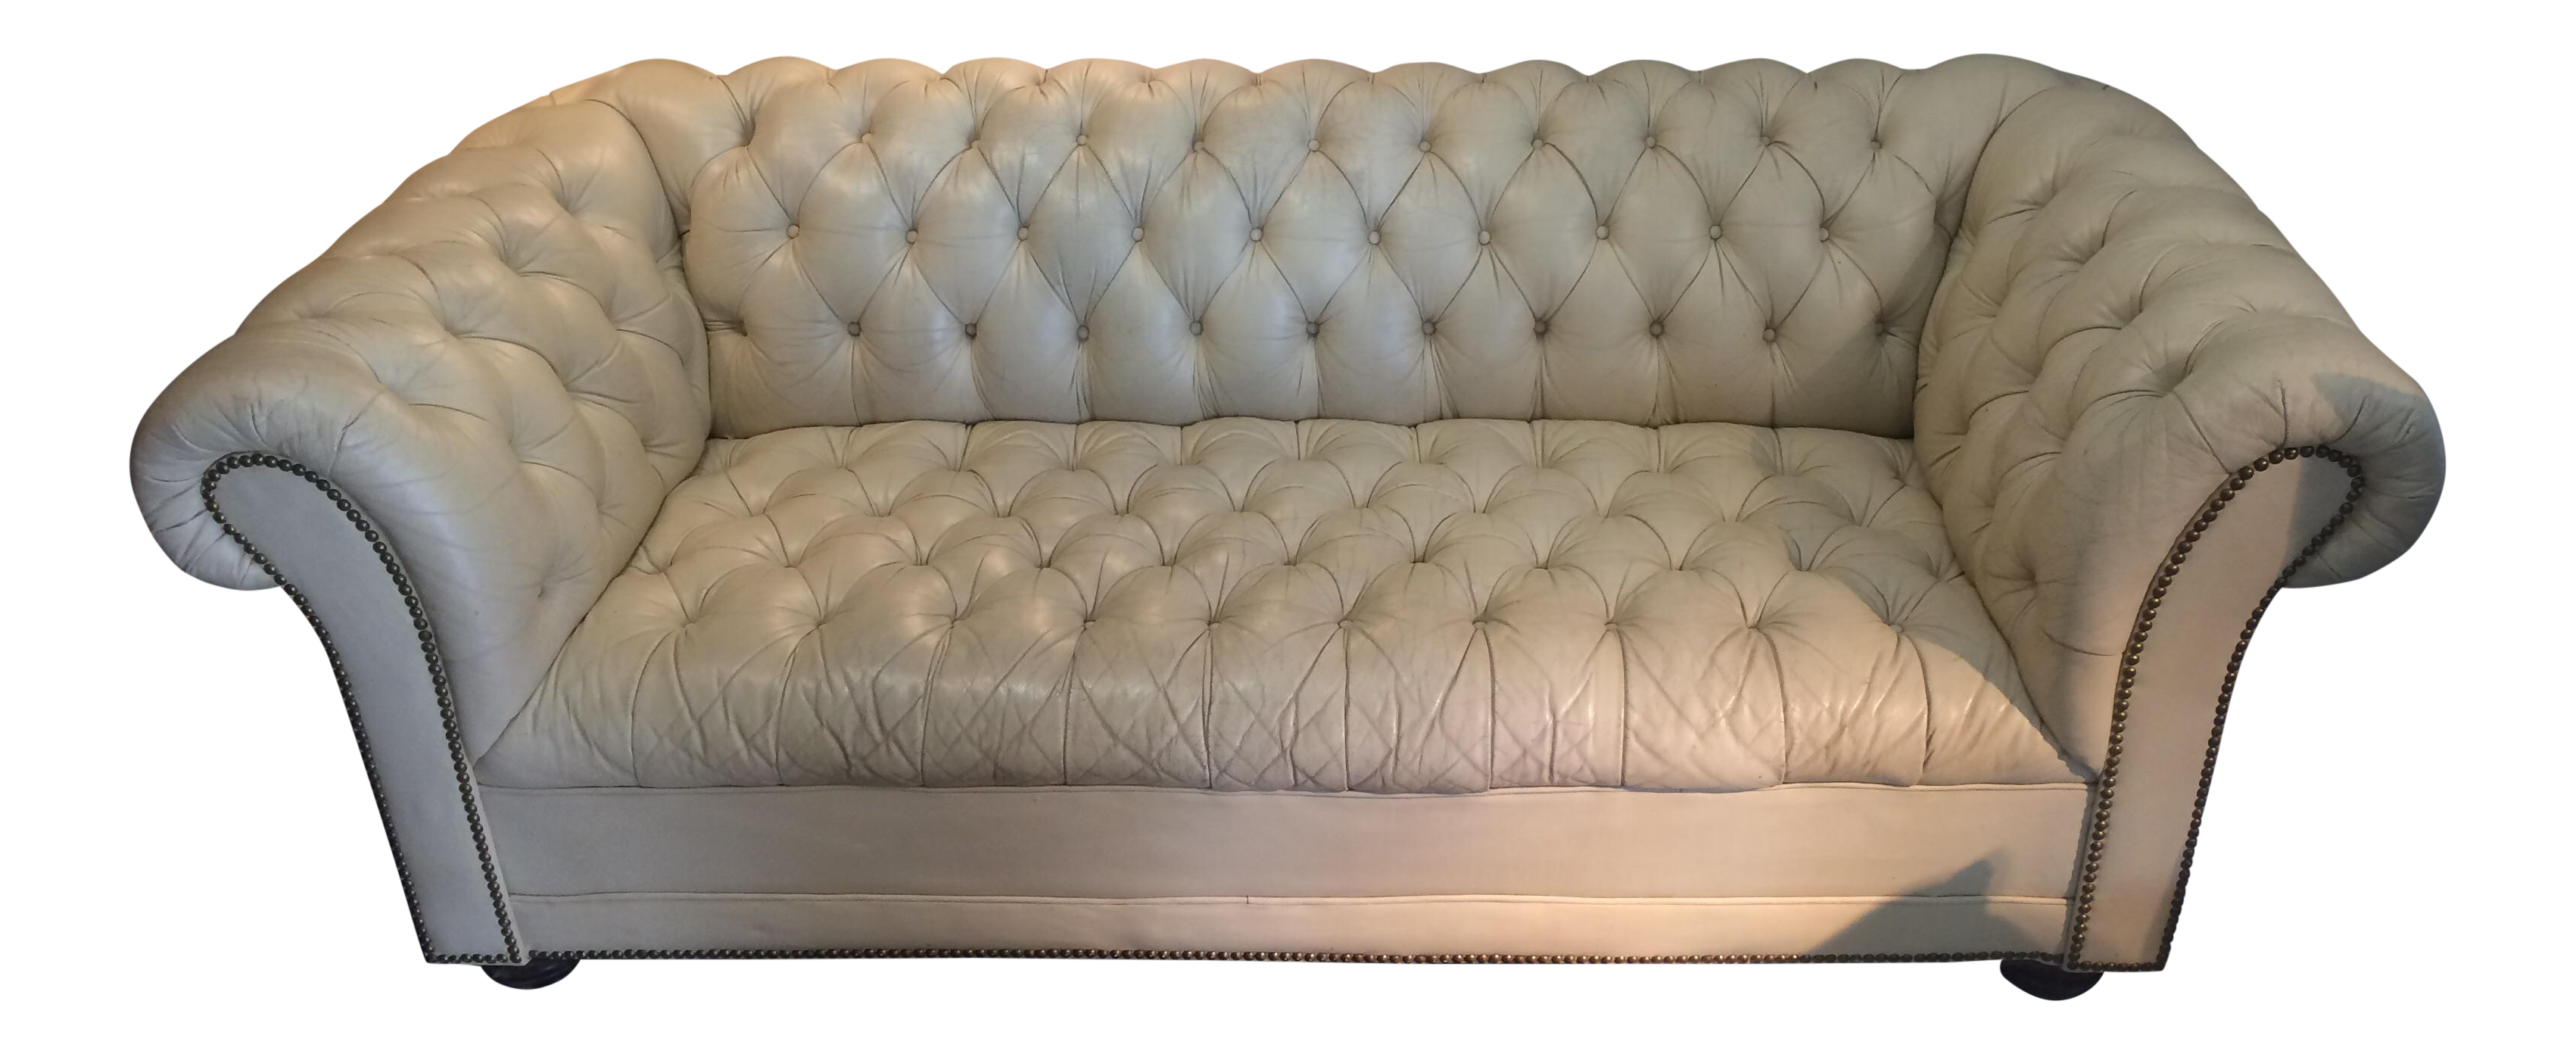 Vintage Cream Leather Chesterfield Sofa Chairish